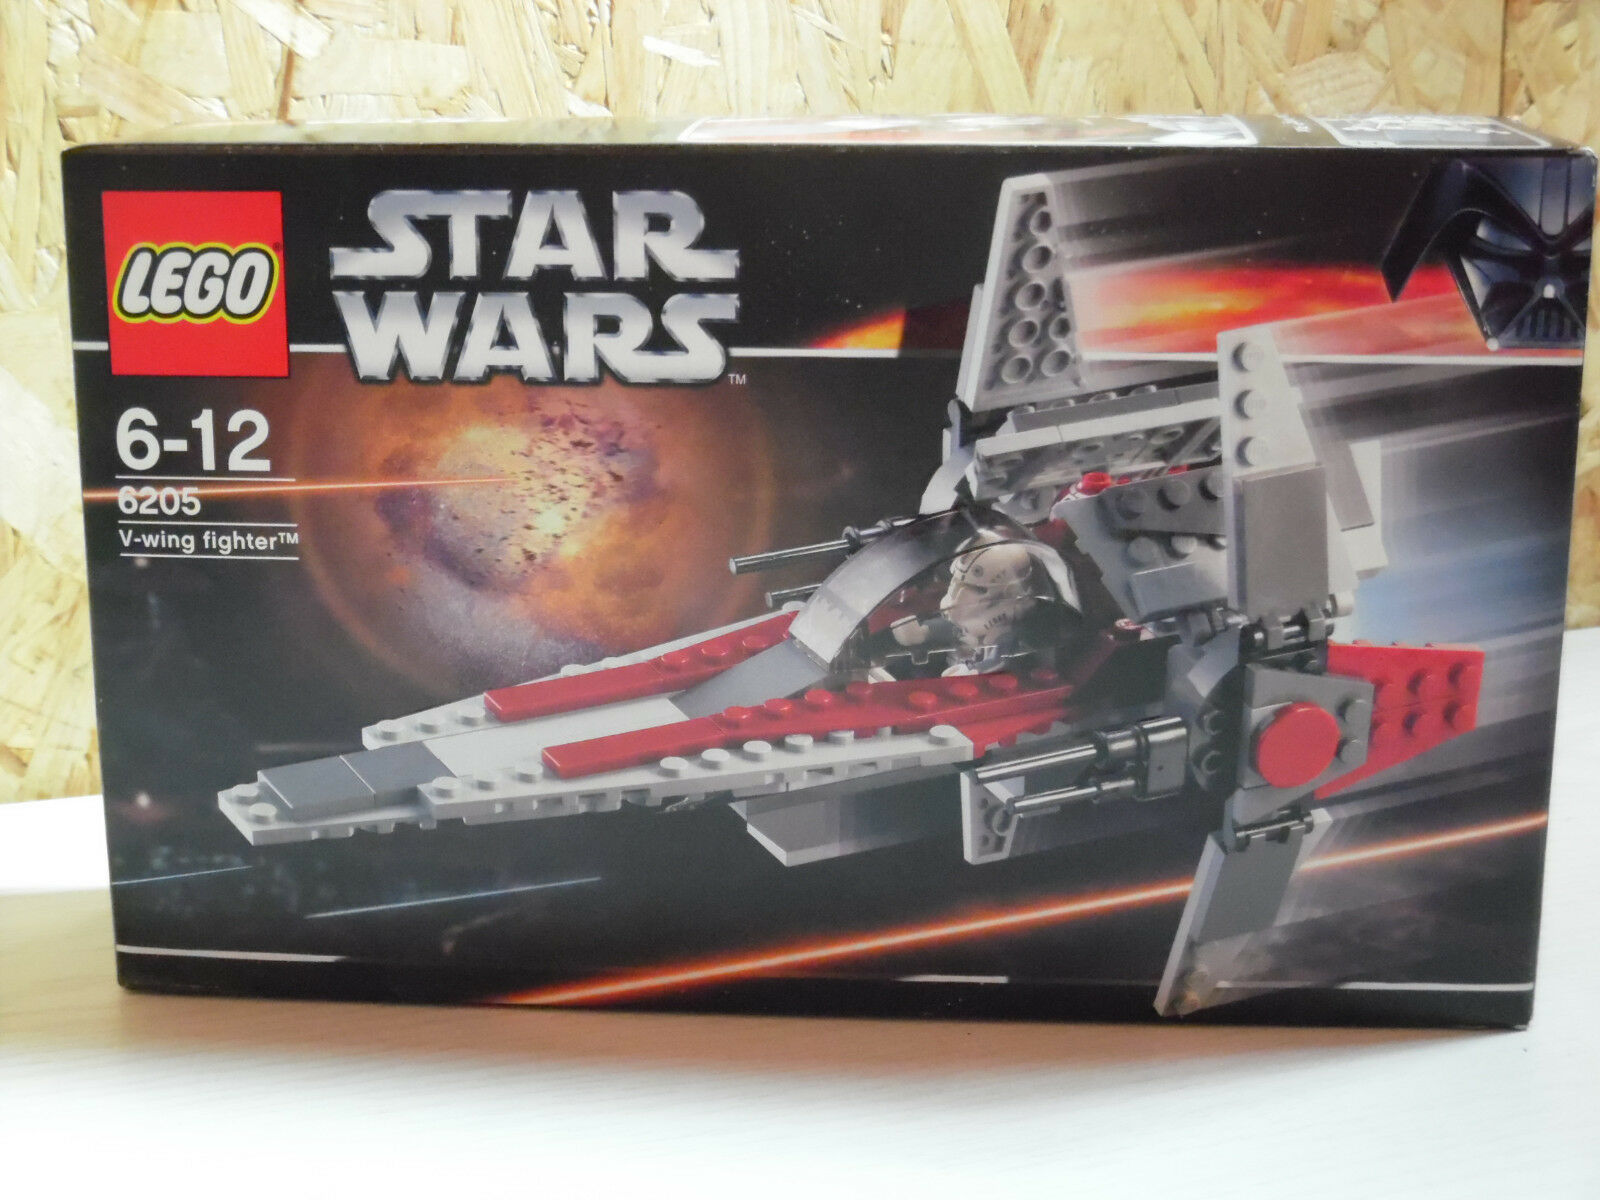 LEGO Star Wars   V-Wing fighter   6205   Neu und OVP